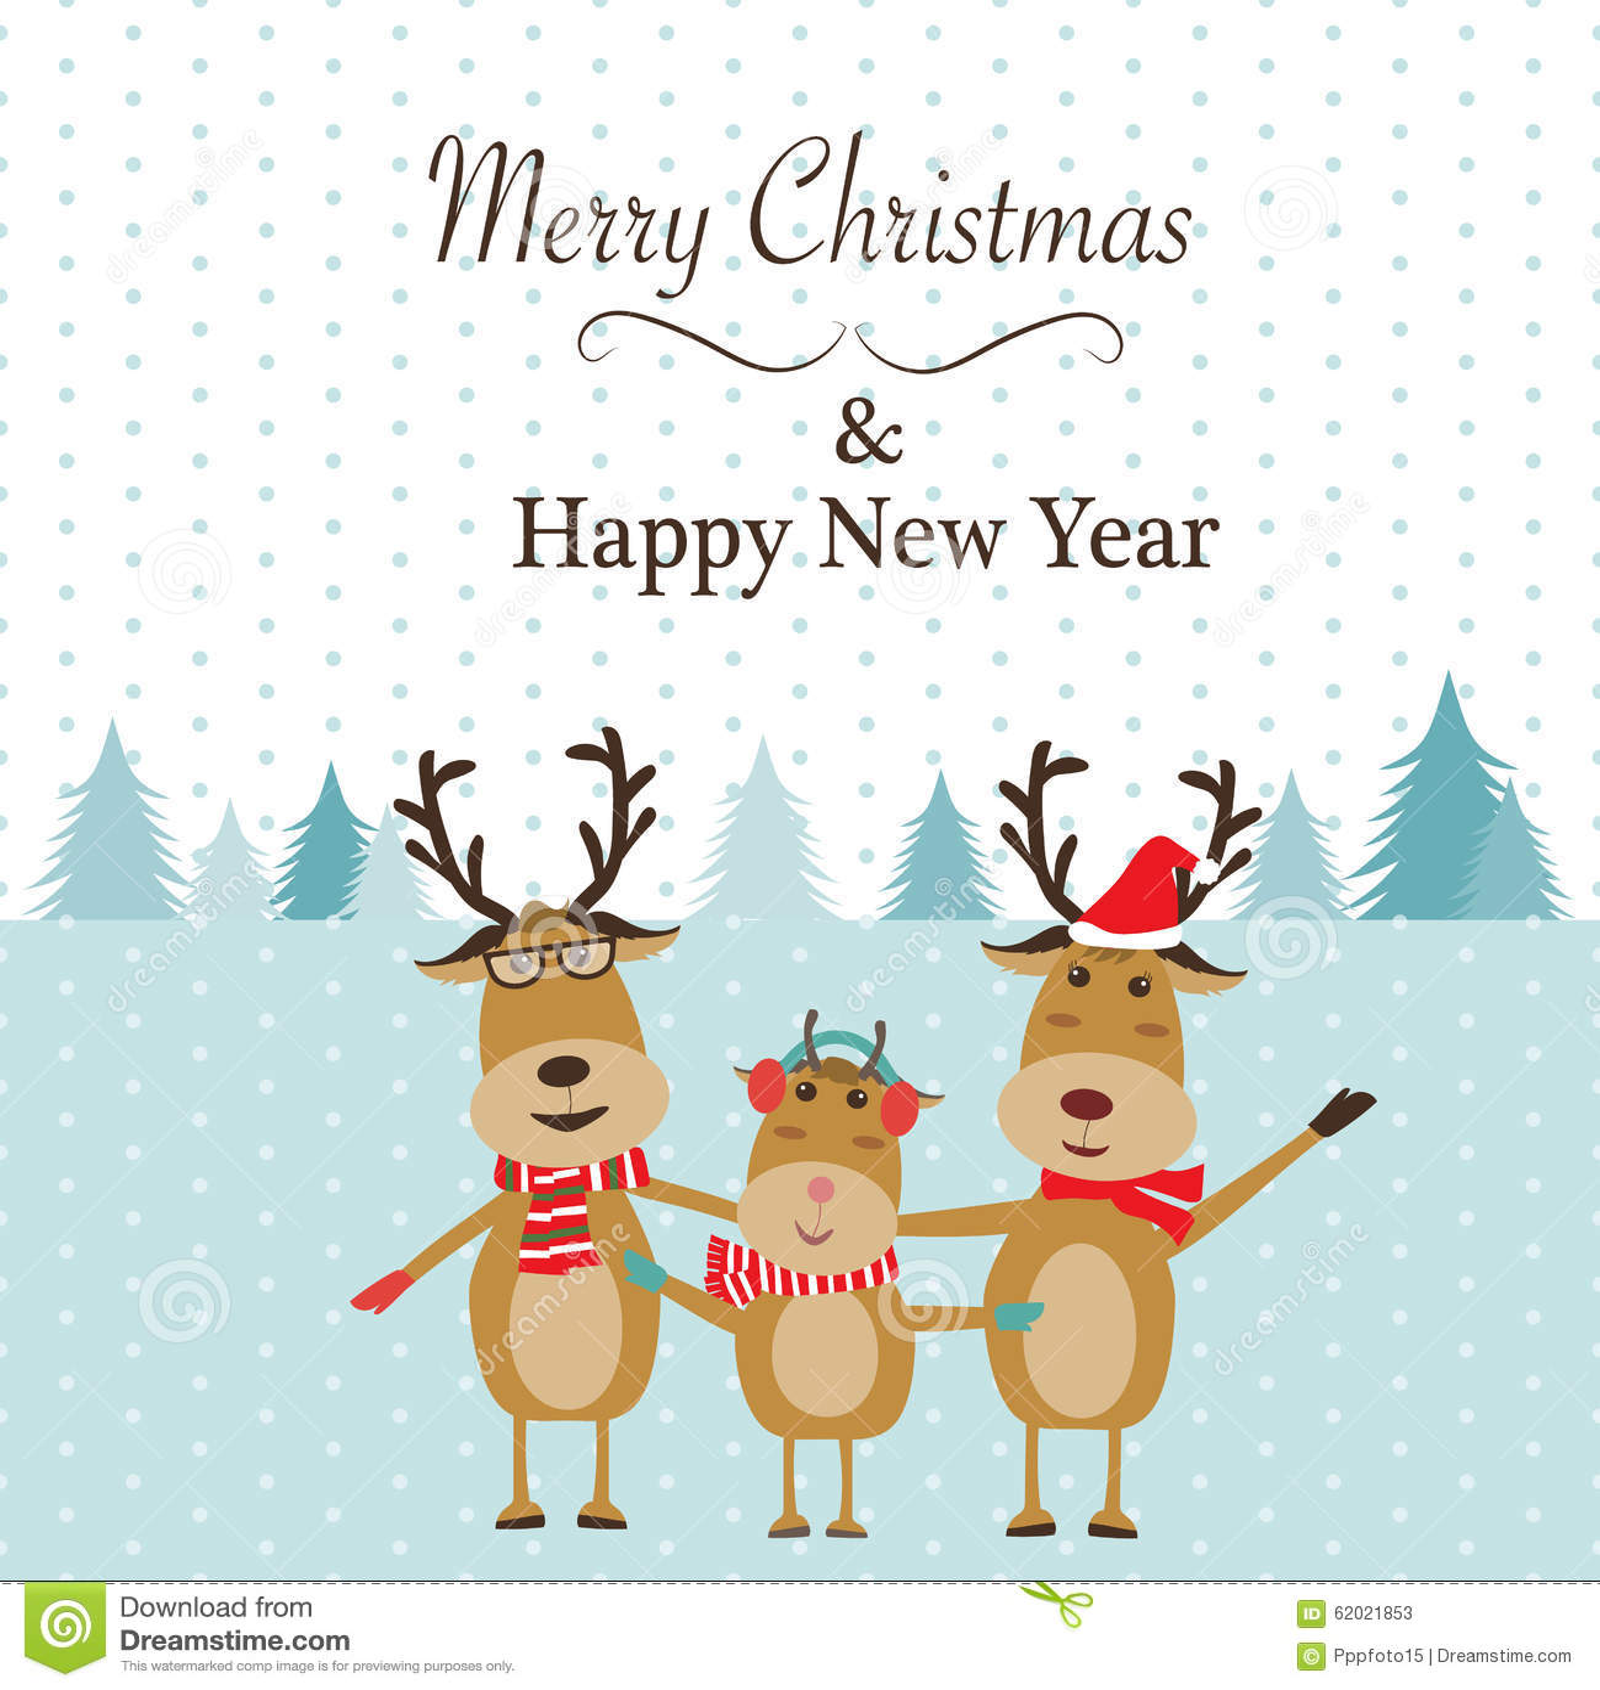 Merry Christmas Family.Reindeer Family Merry Christmas Stock Vector Illustration